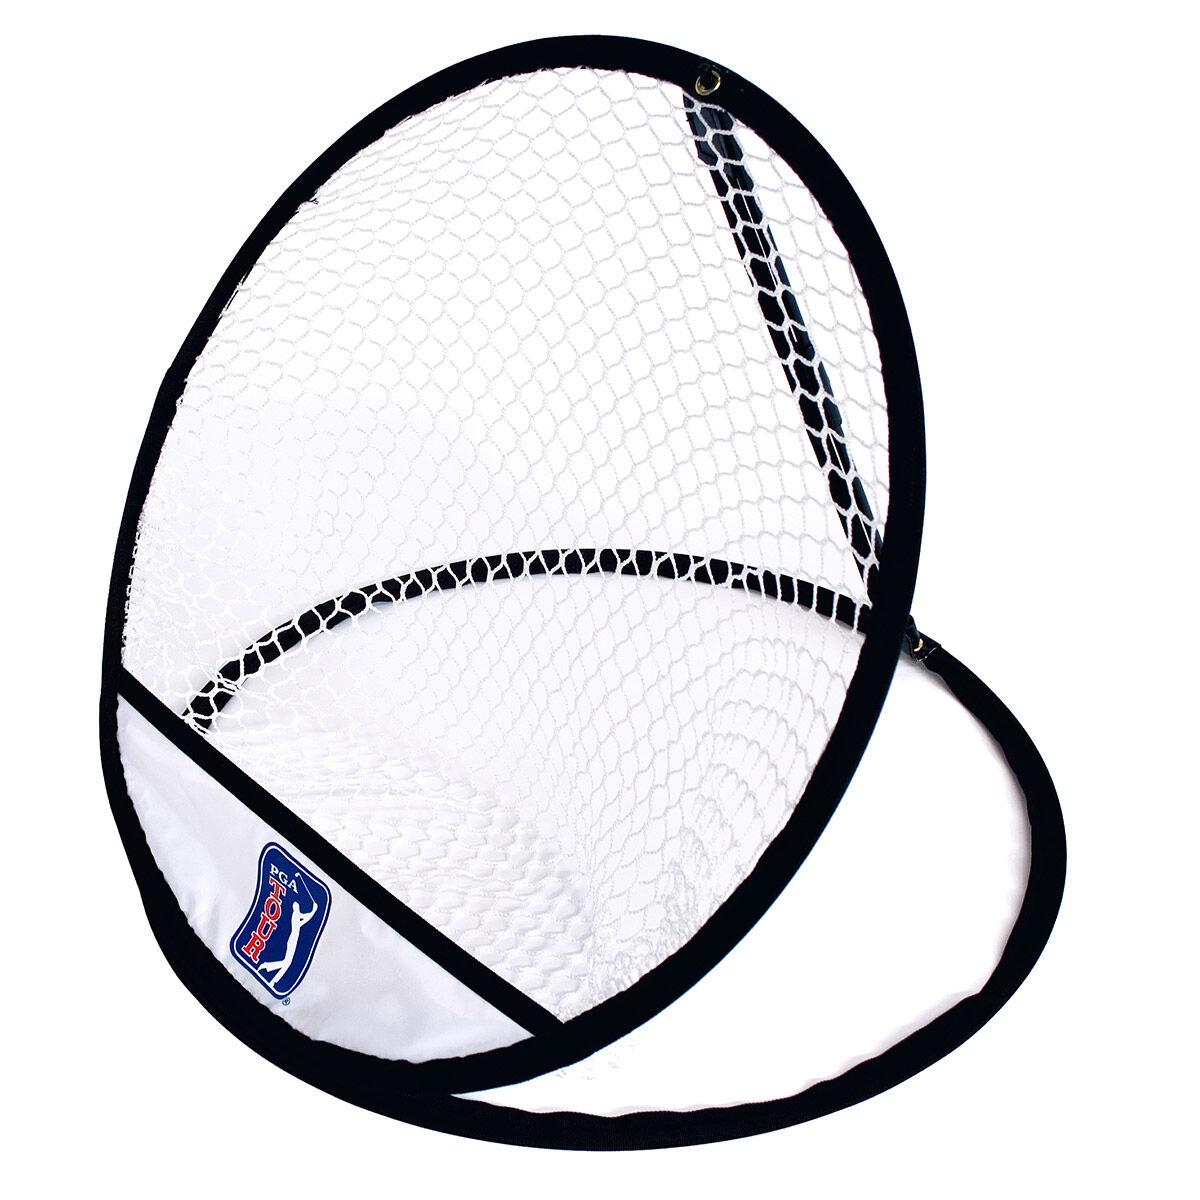 PGA Tour Black Pop Up Golf Chipping Target Net, One size | American Golf